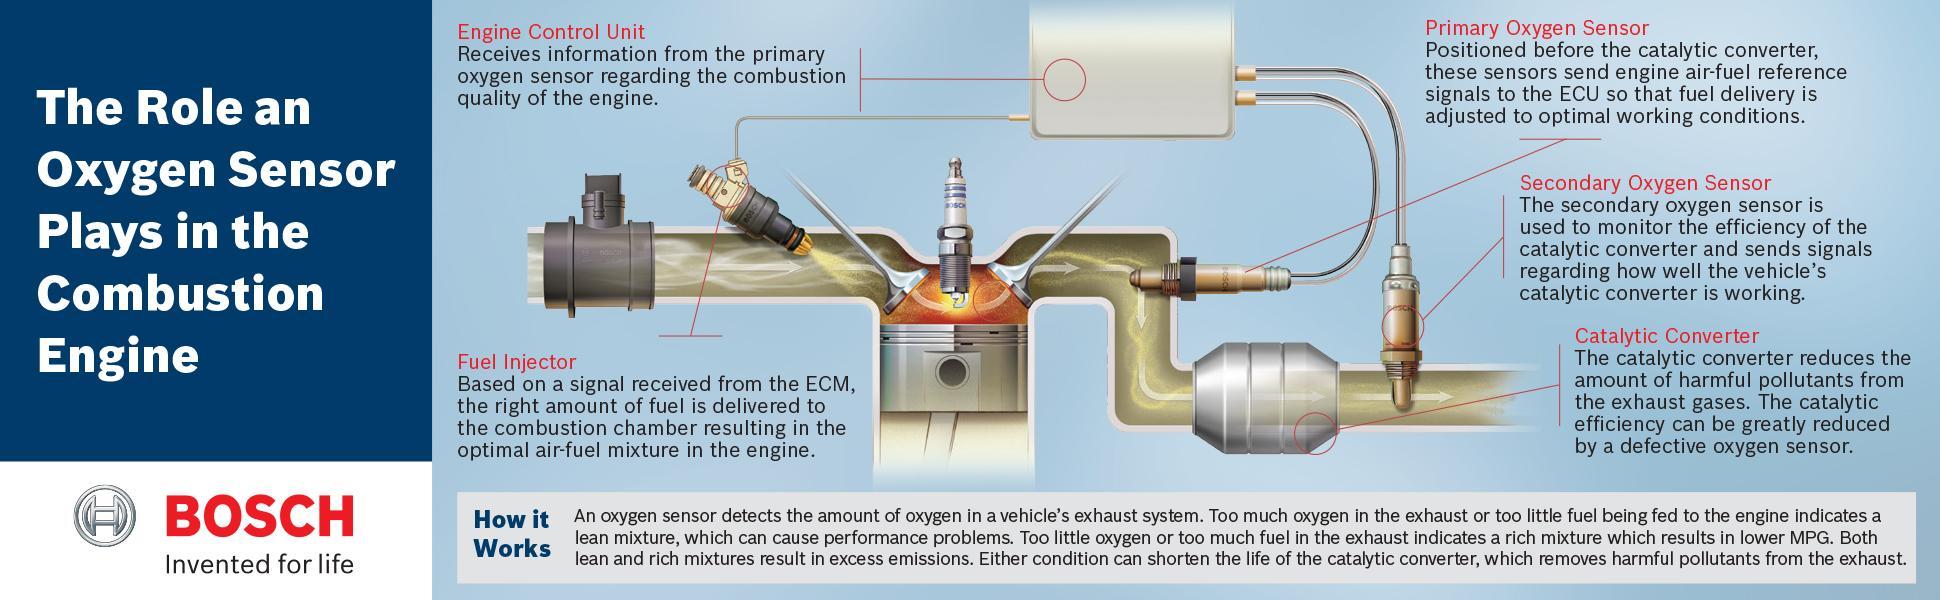 Kawasaki 20 Hp Diagram Free Wiring For You Kohler 23 26 Engine Briggs Ninja H2